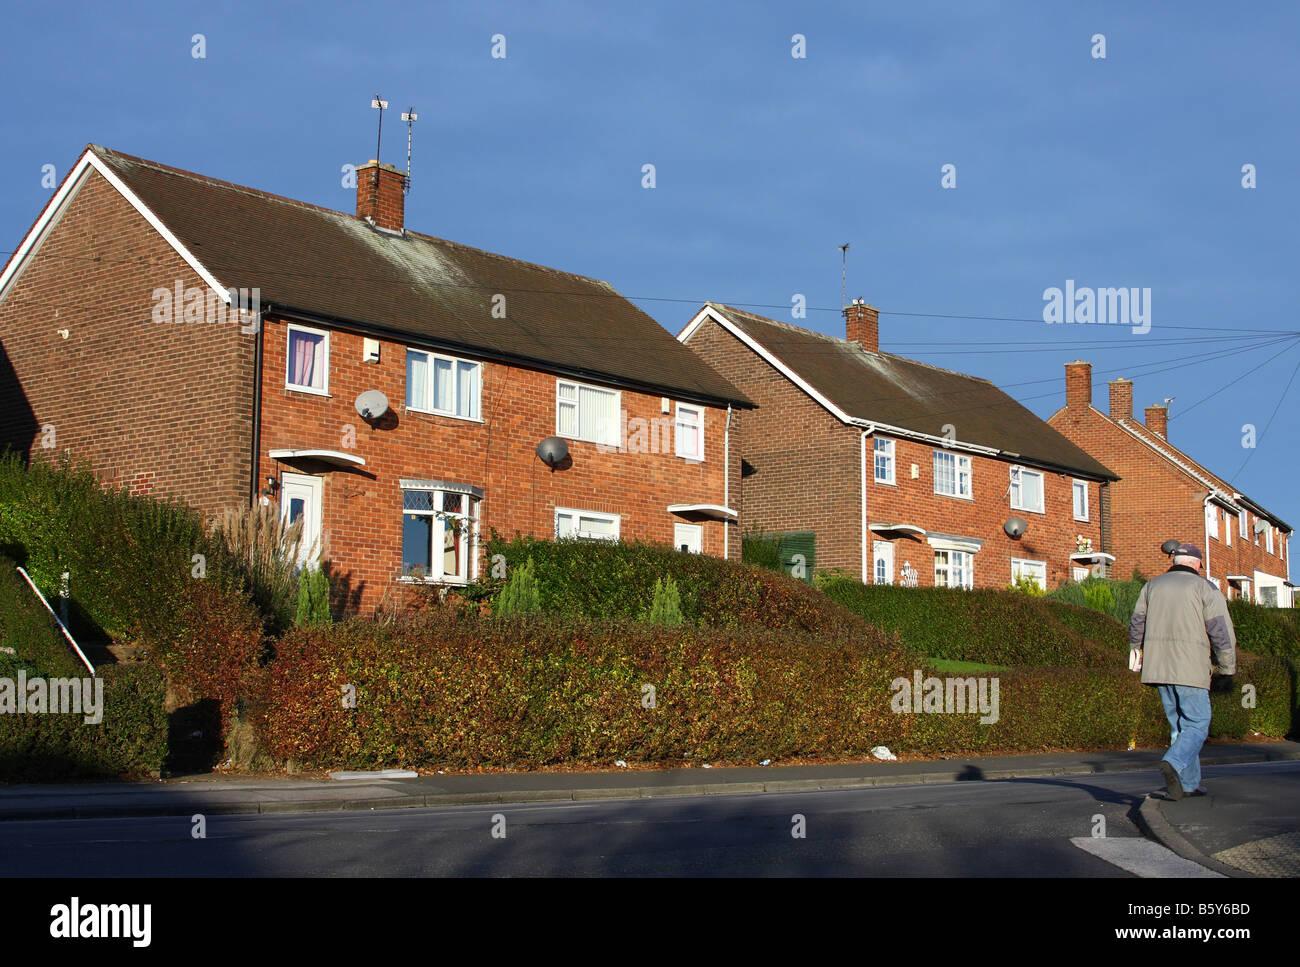 ^ ouncil Houses On Beckhampton oad, Bestwood, Nottingham, ngland ...